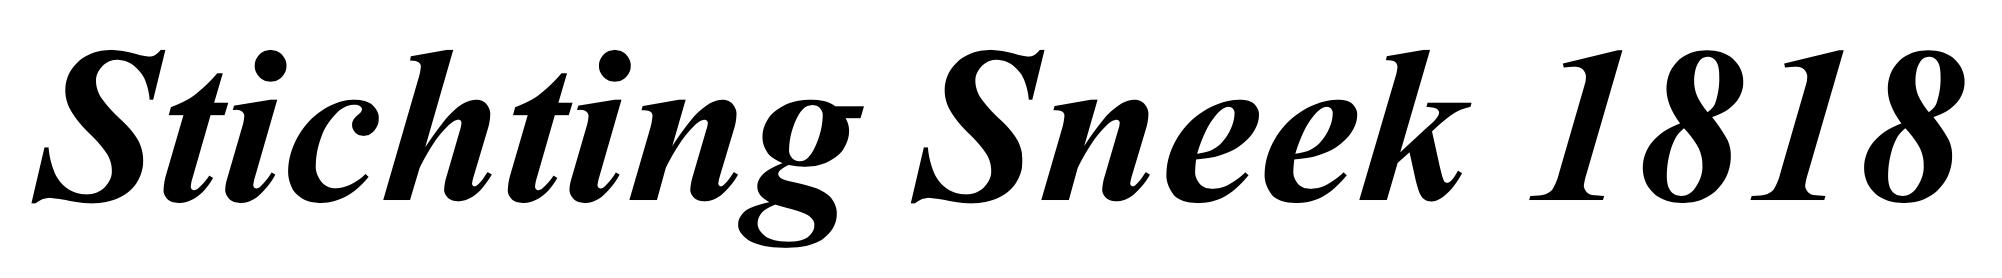 STICHTING SNEEK VAN WELEER | Stichting Sneek 1818